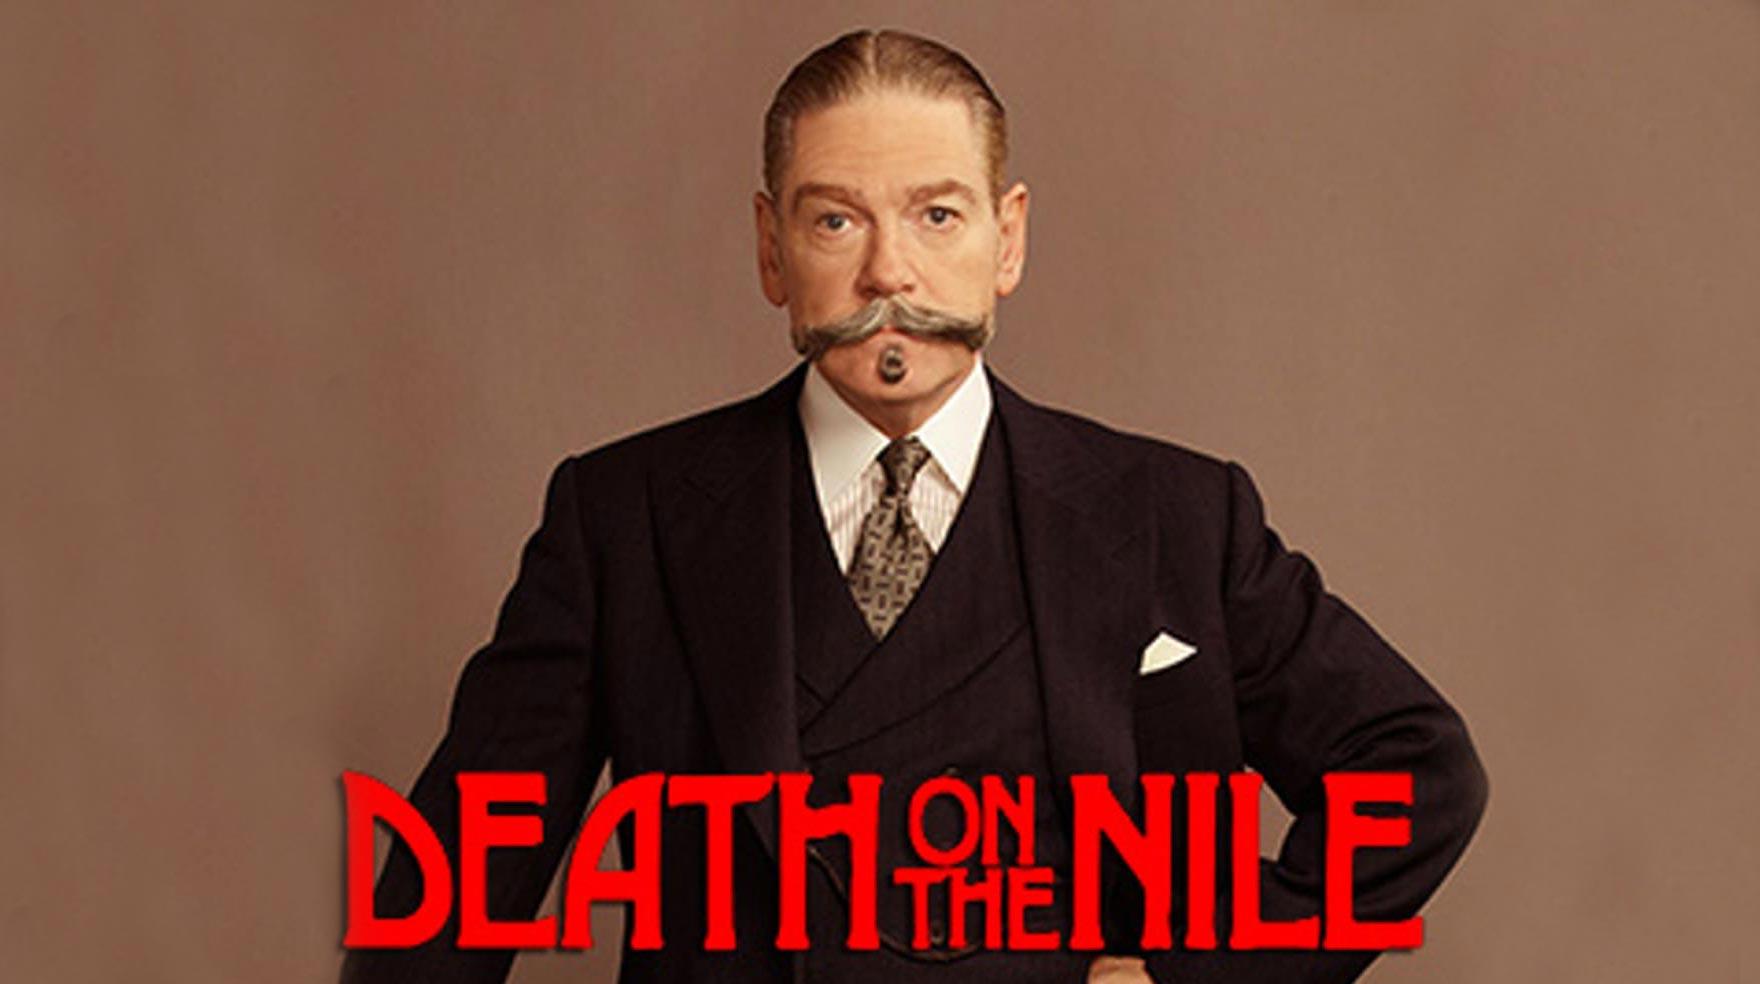 Death On The Nile - октомври 2020 г.